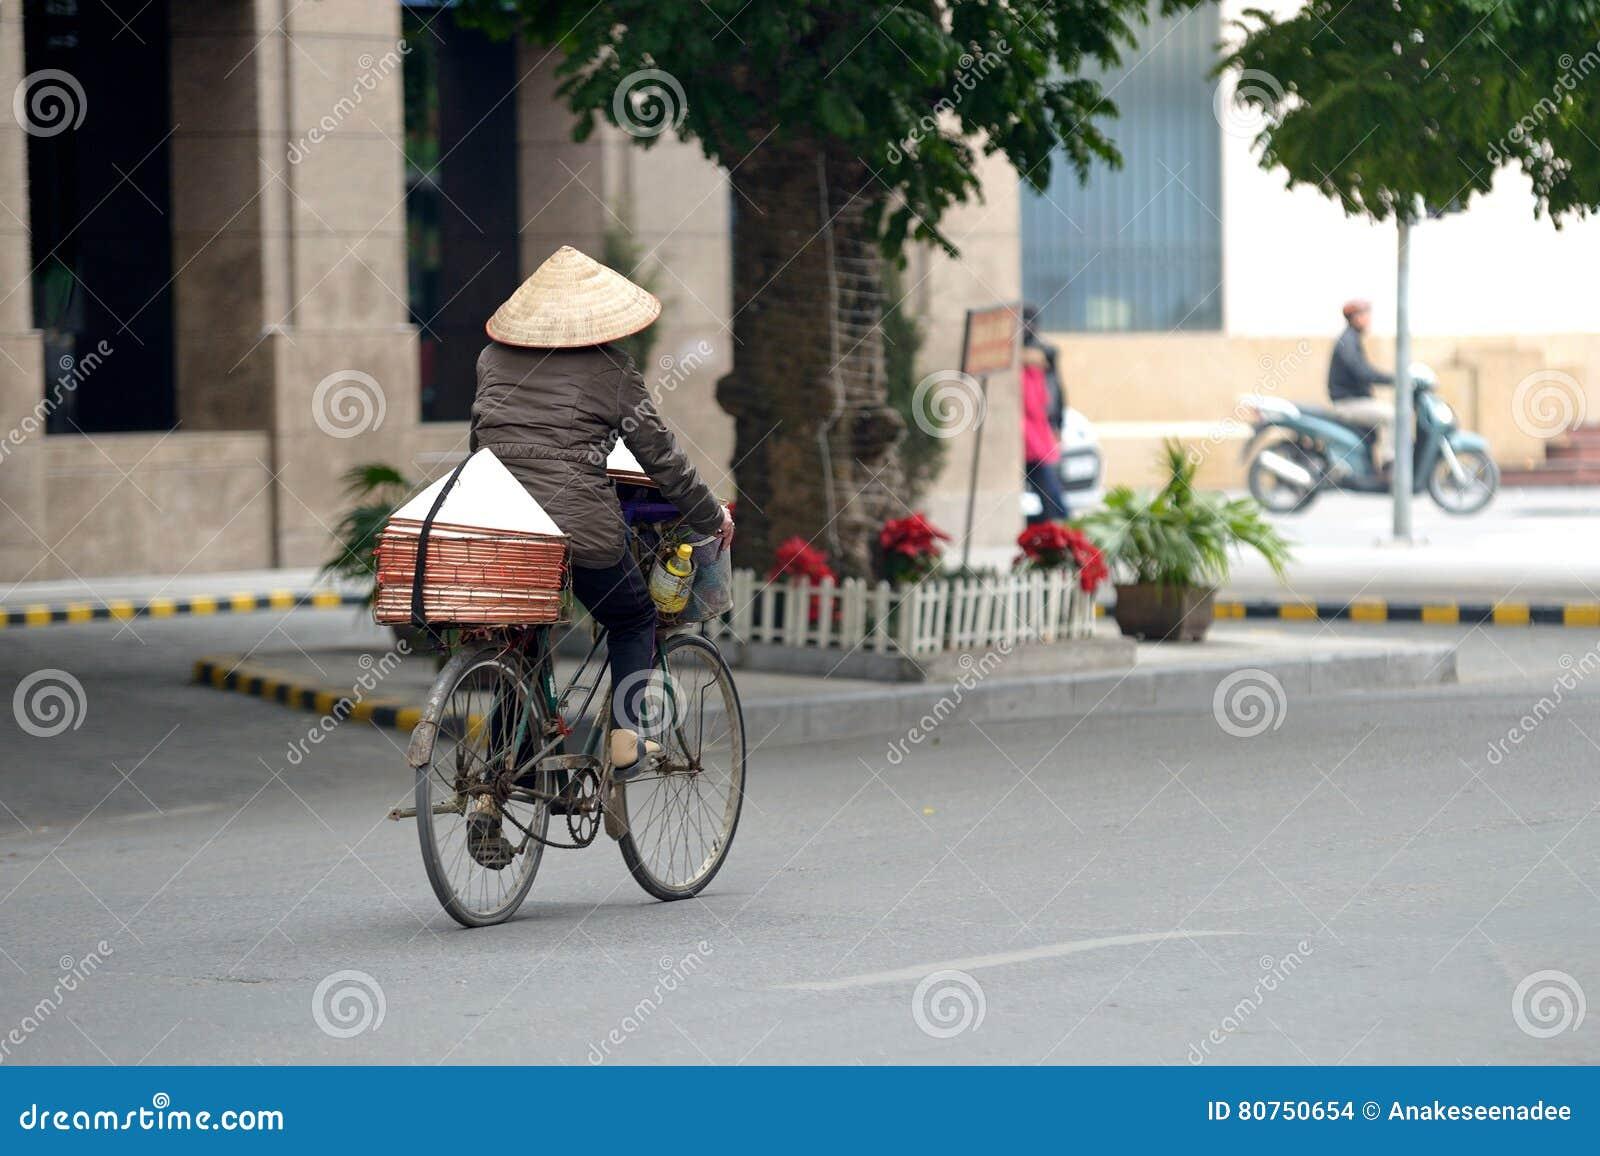 Vietnam bicycle